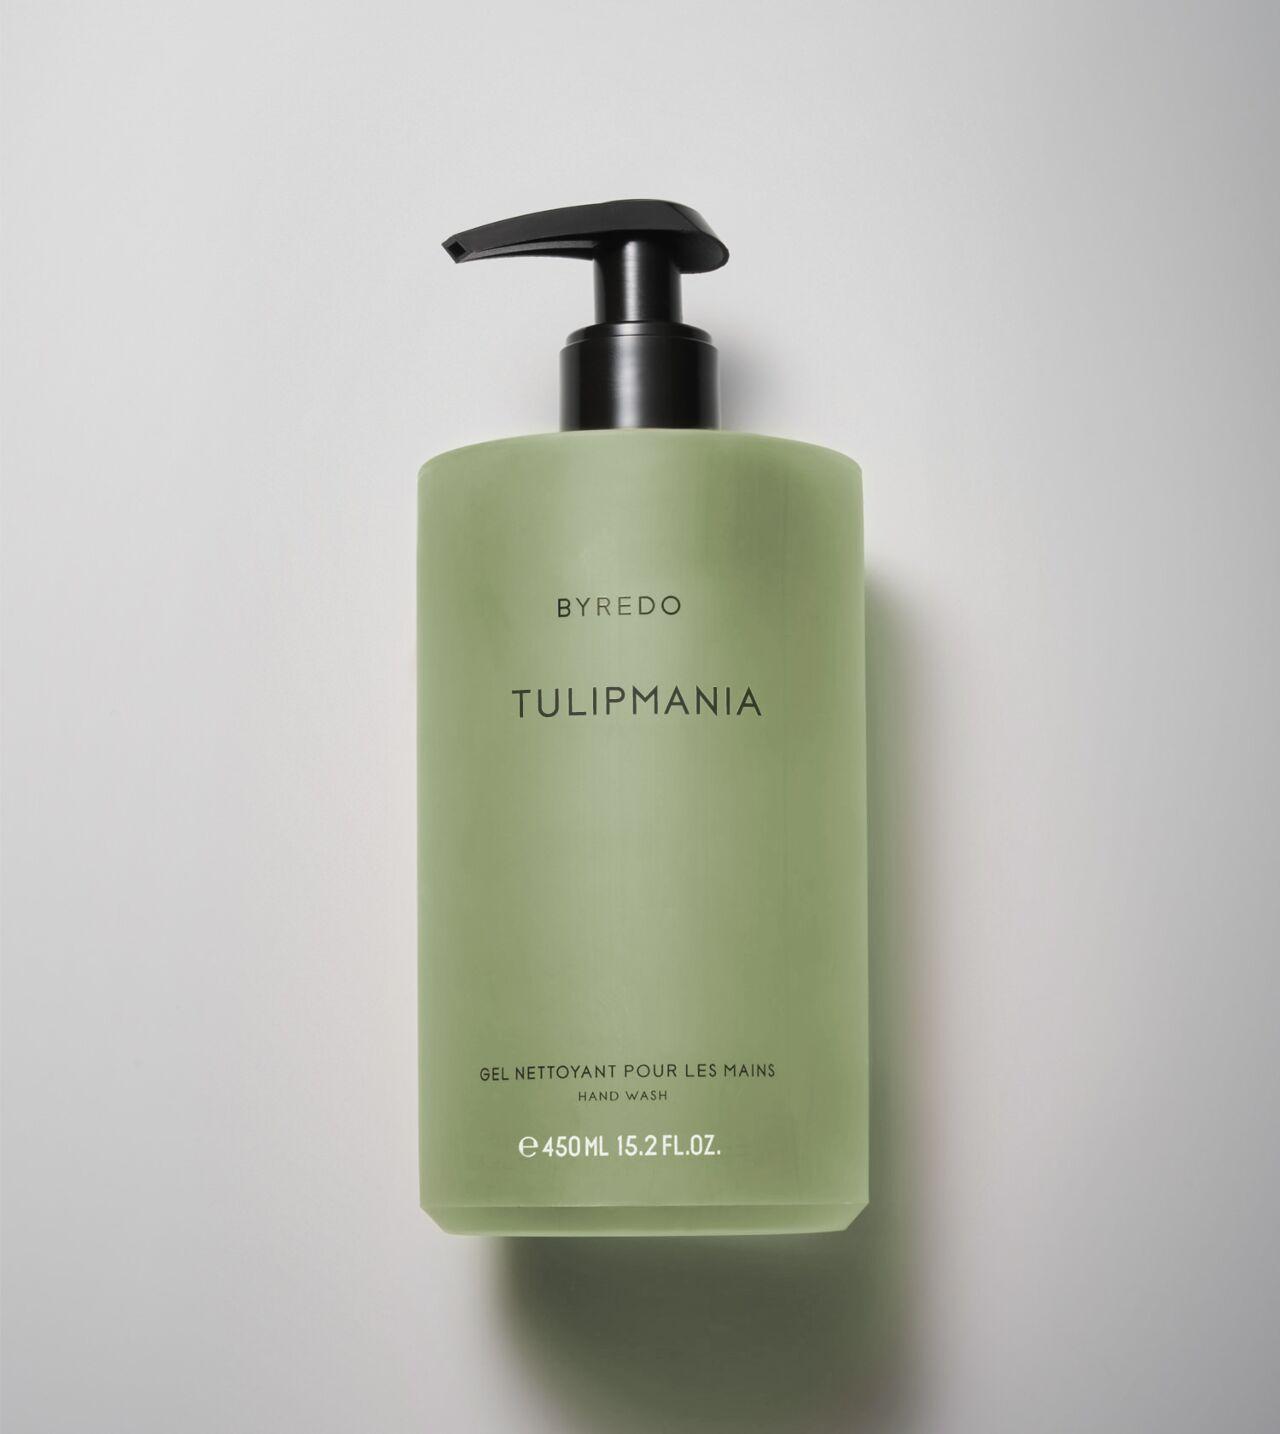 Picture of Byredo Tulipmania Hand wash